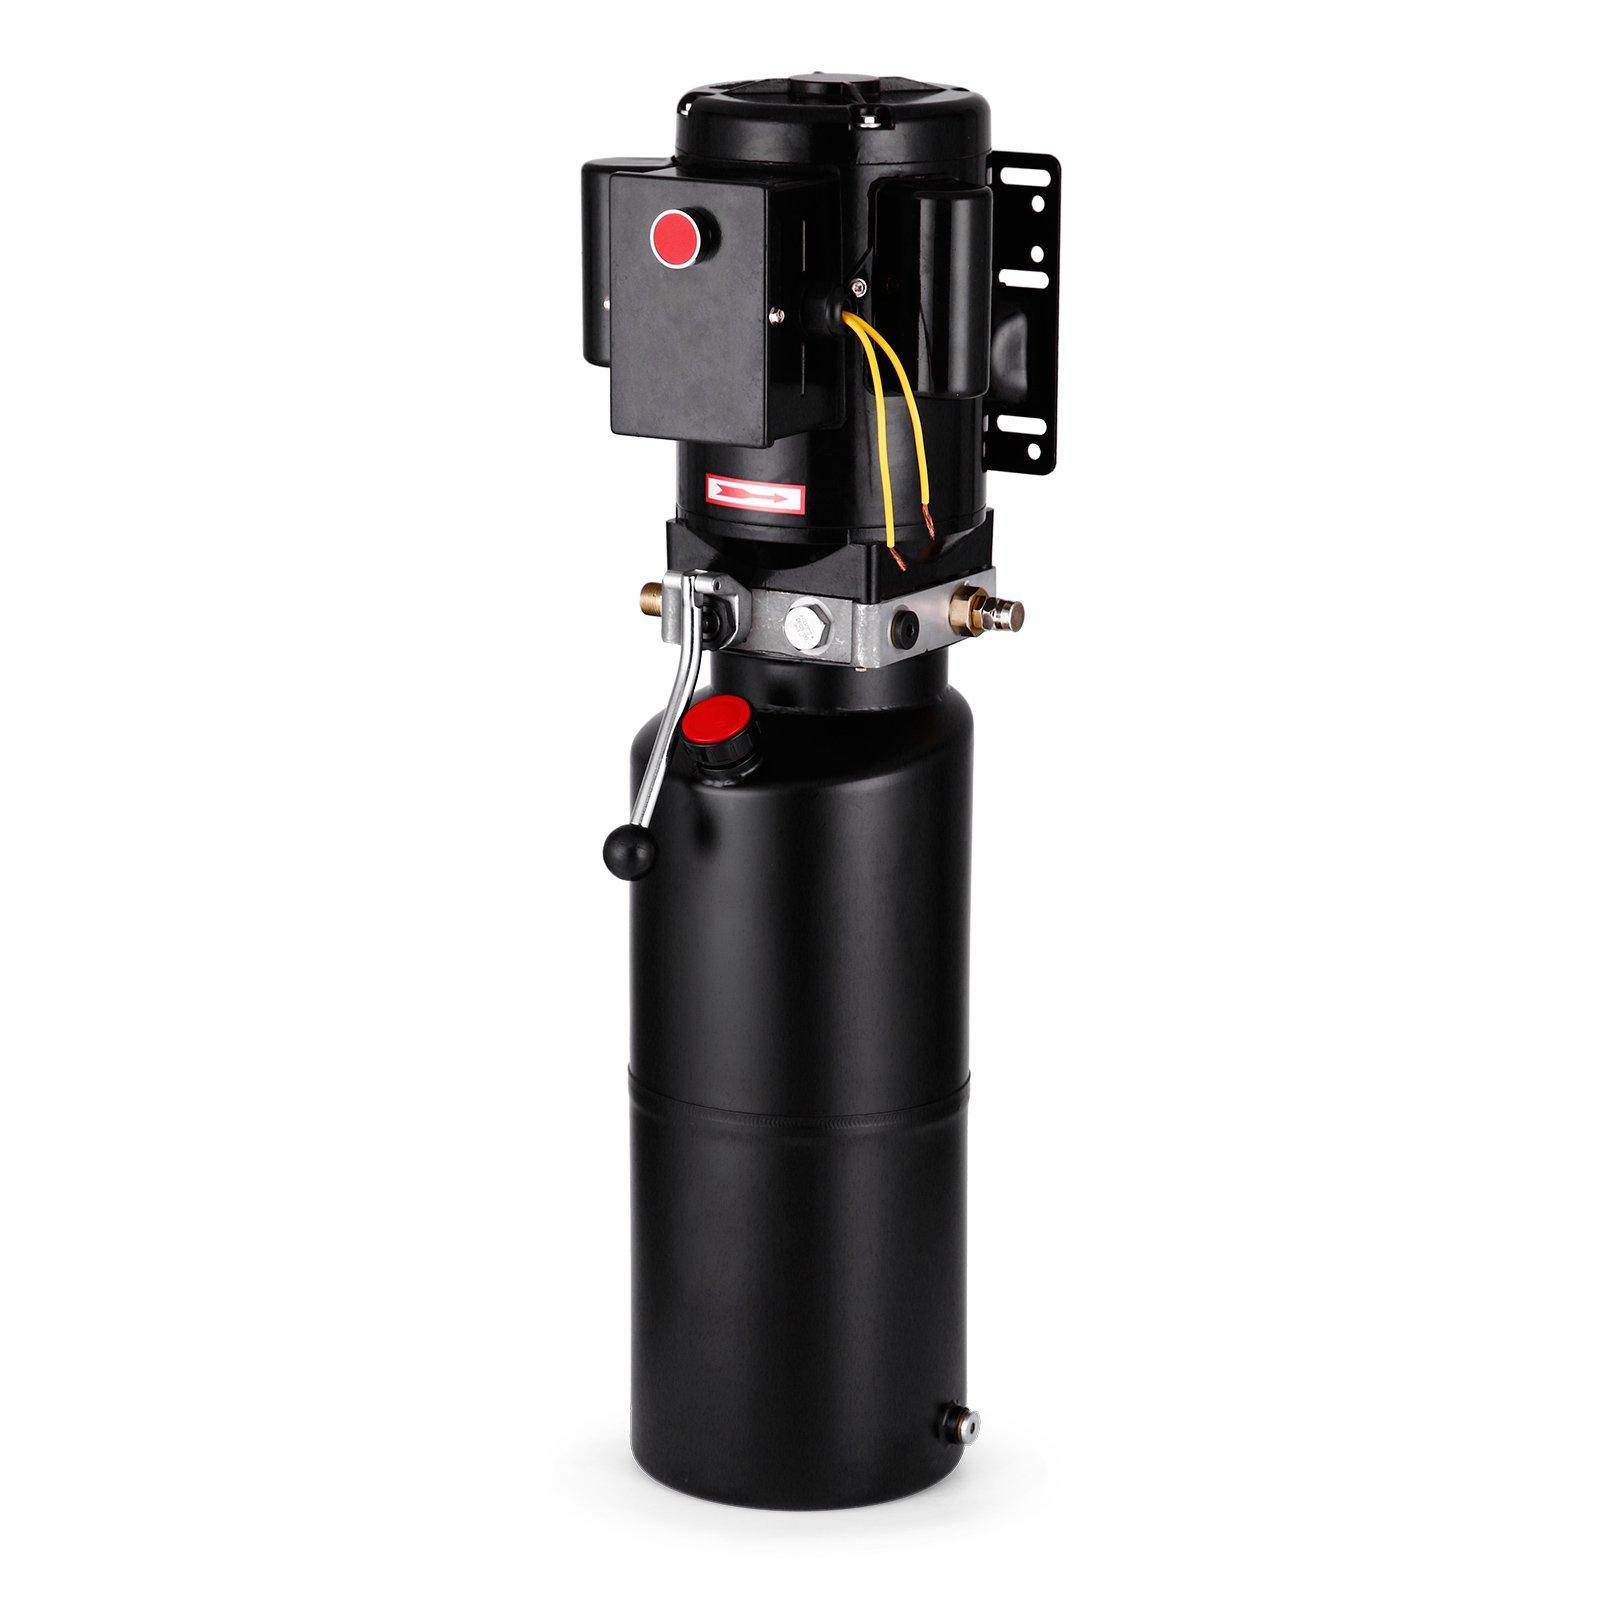 Mophorn Car Lift Power Unit 2.64 Gallon 3HP Auto Lift Power Unit 220V 60HZ Hydraulic Power Unit 2950 PSI Adjustable Hydraulic Pump Pressure